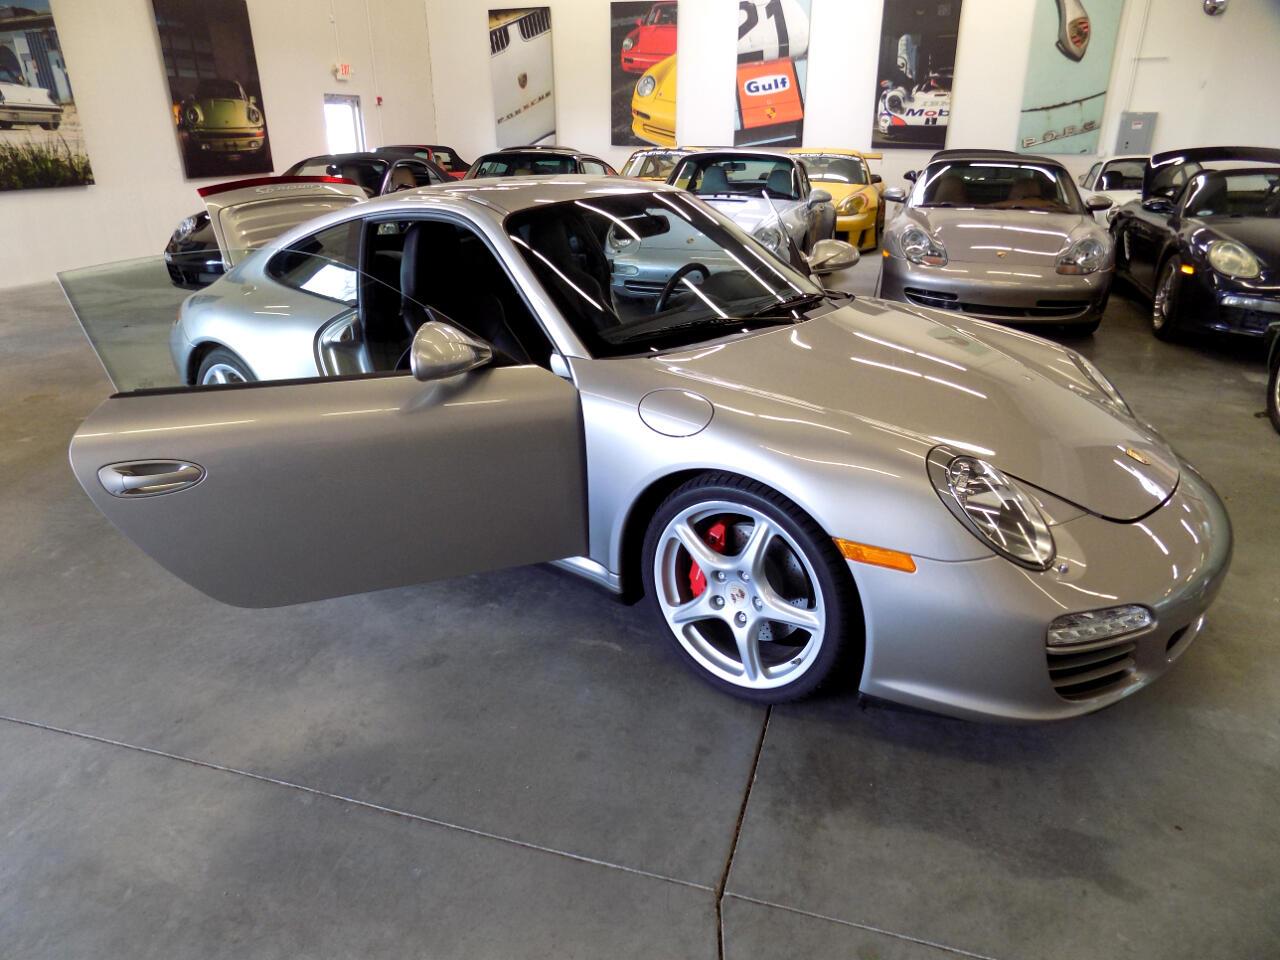 2011 Porsche 911 Carrera 4S Coupe